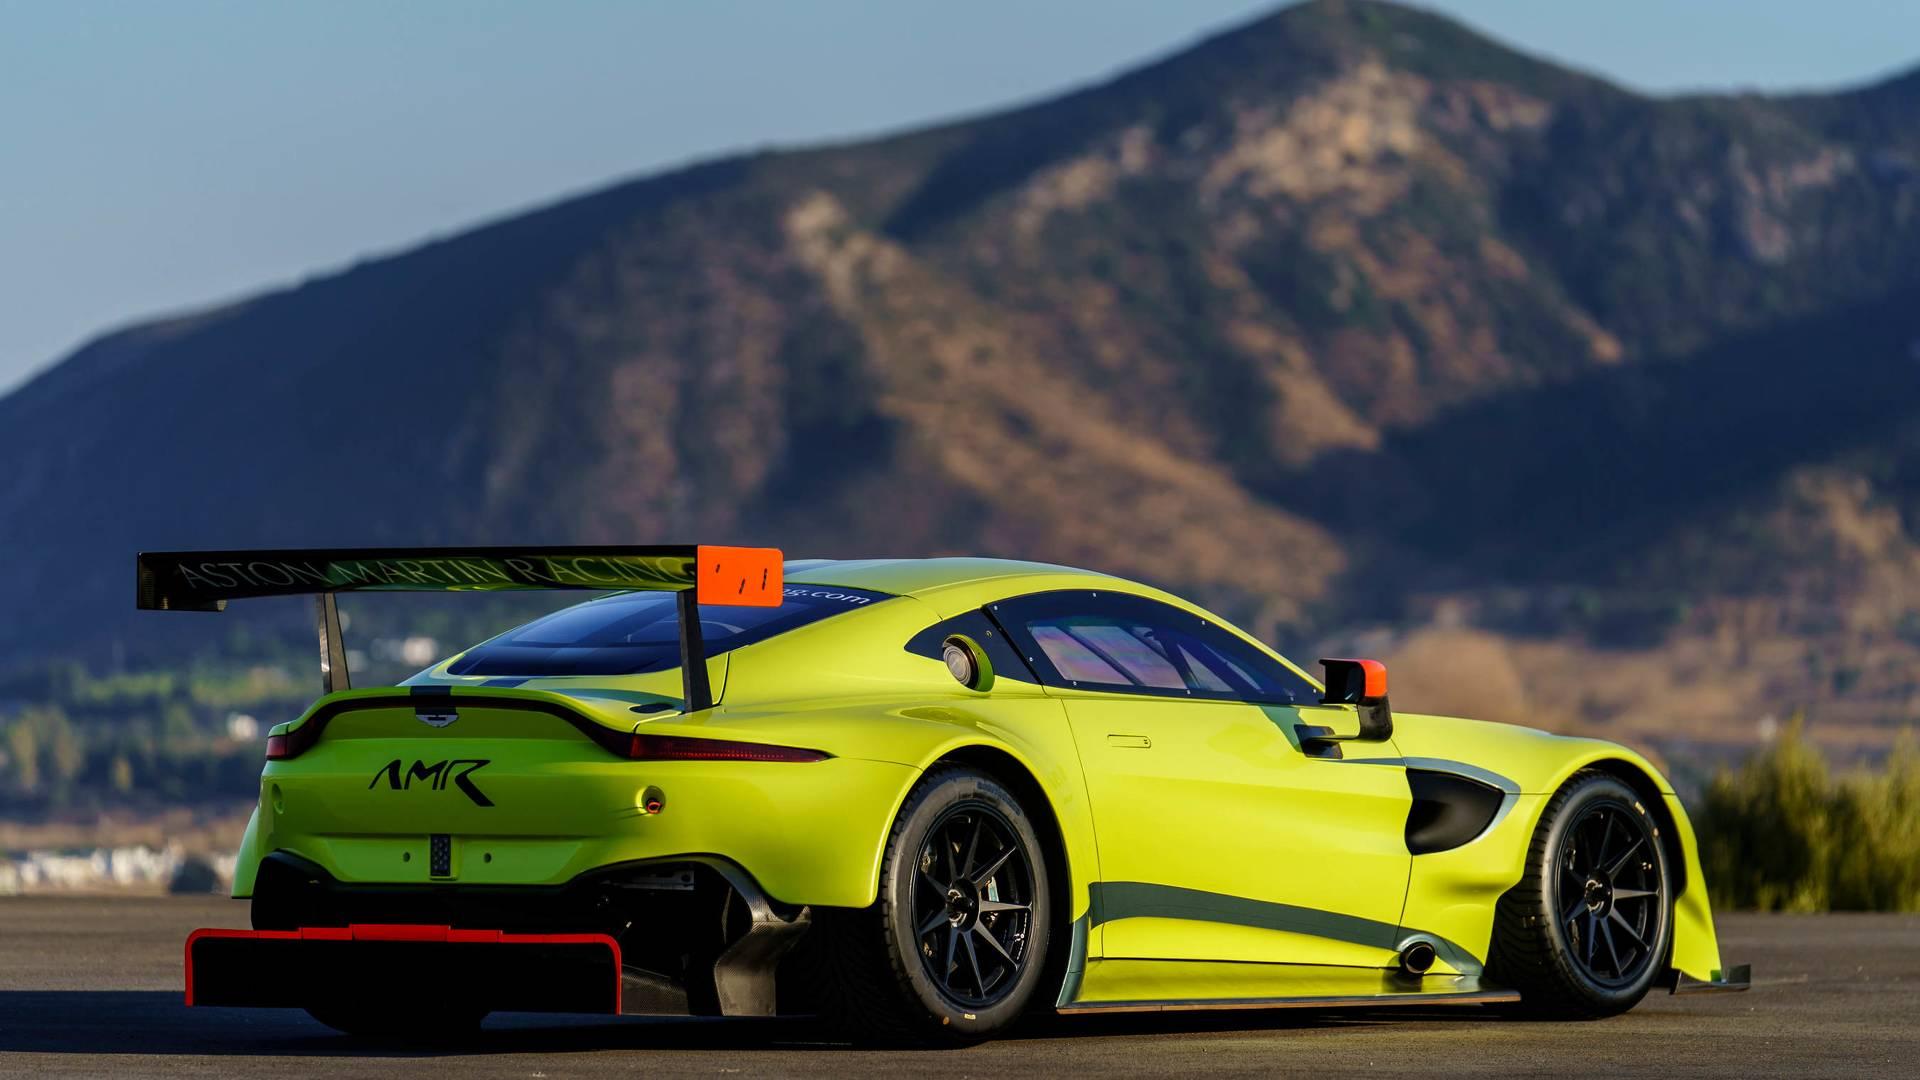 5a19230284376 2018 aston martin vantage gte استون مارتین GTE خودروی جدید با پیشرفت جدید برای مسابقات رونمایی کرد   اجاره ماشین